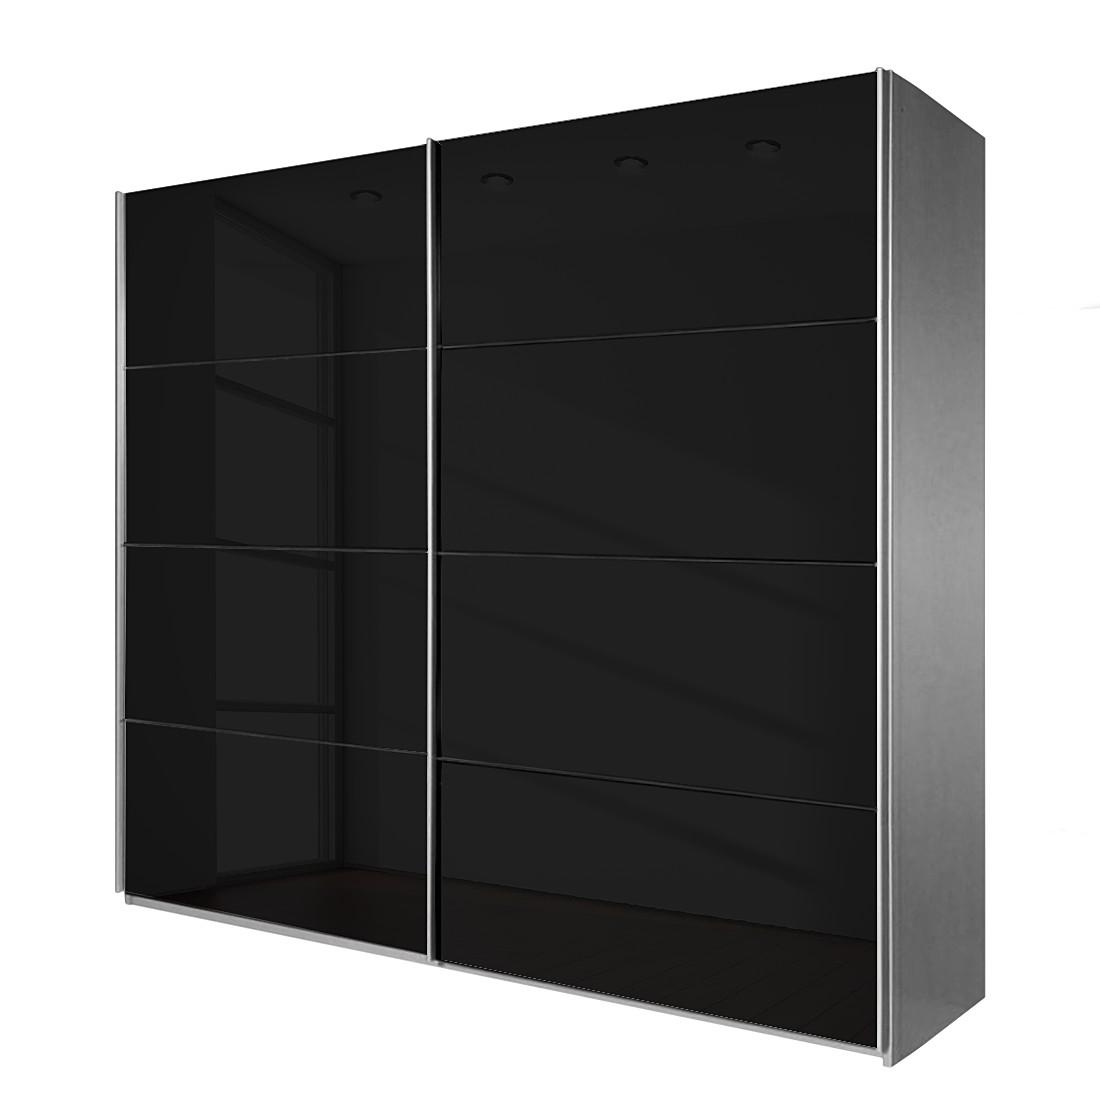 goedkoop Schuifdeurkast Quadra II Aluminiumkleurig zwart glas 271cm 2 deurs 210cm Rauch